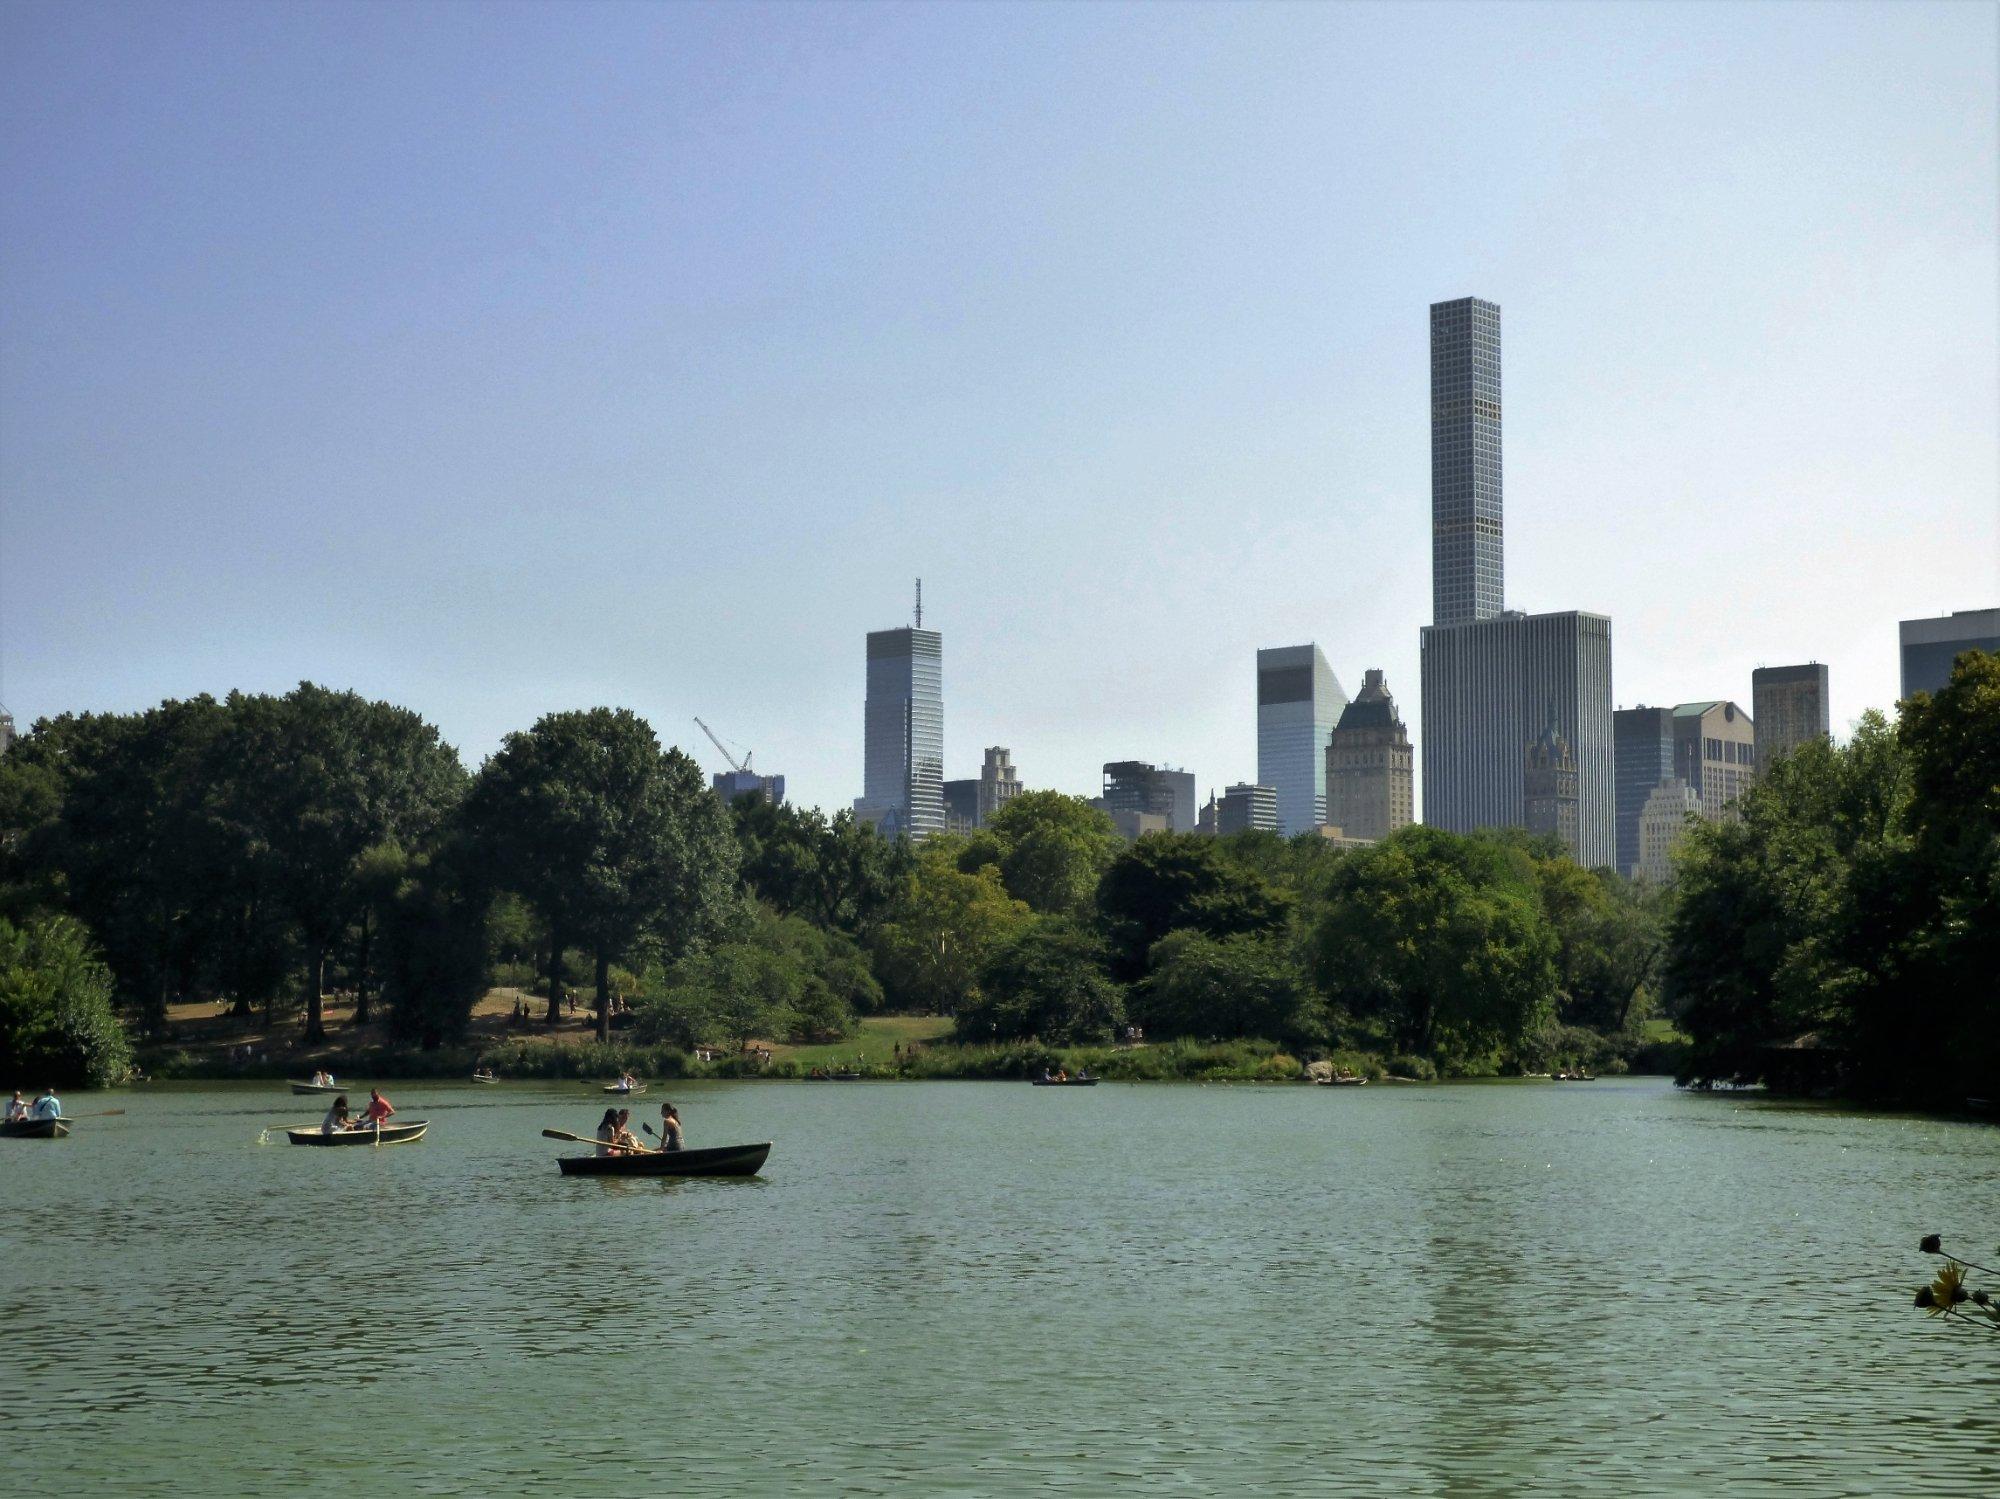 Manhattan Skyline from Central Park